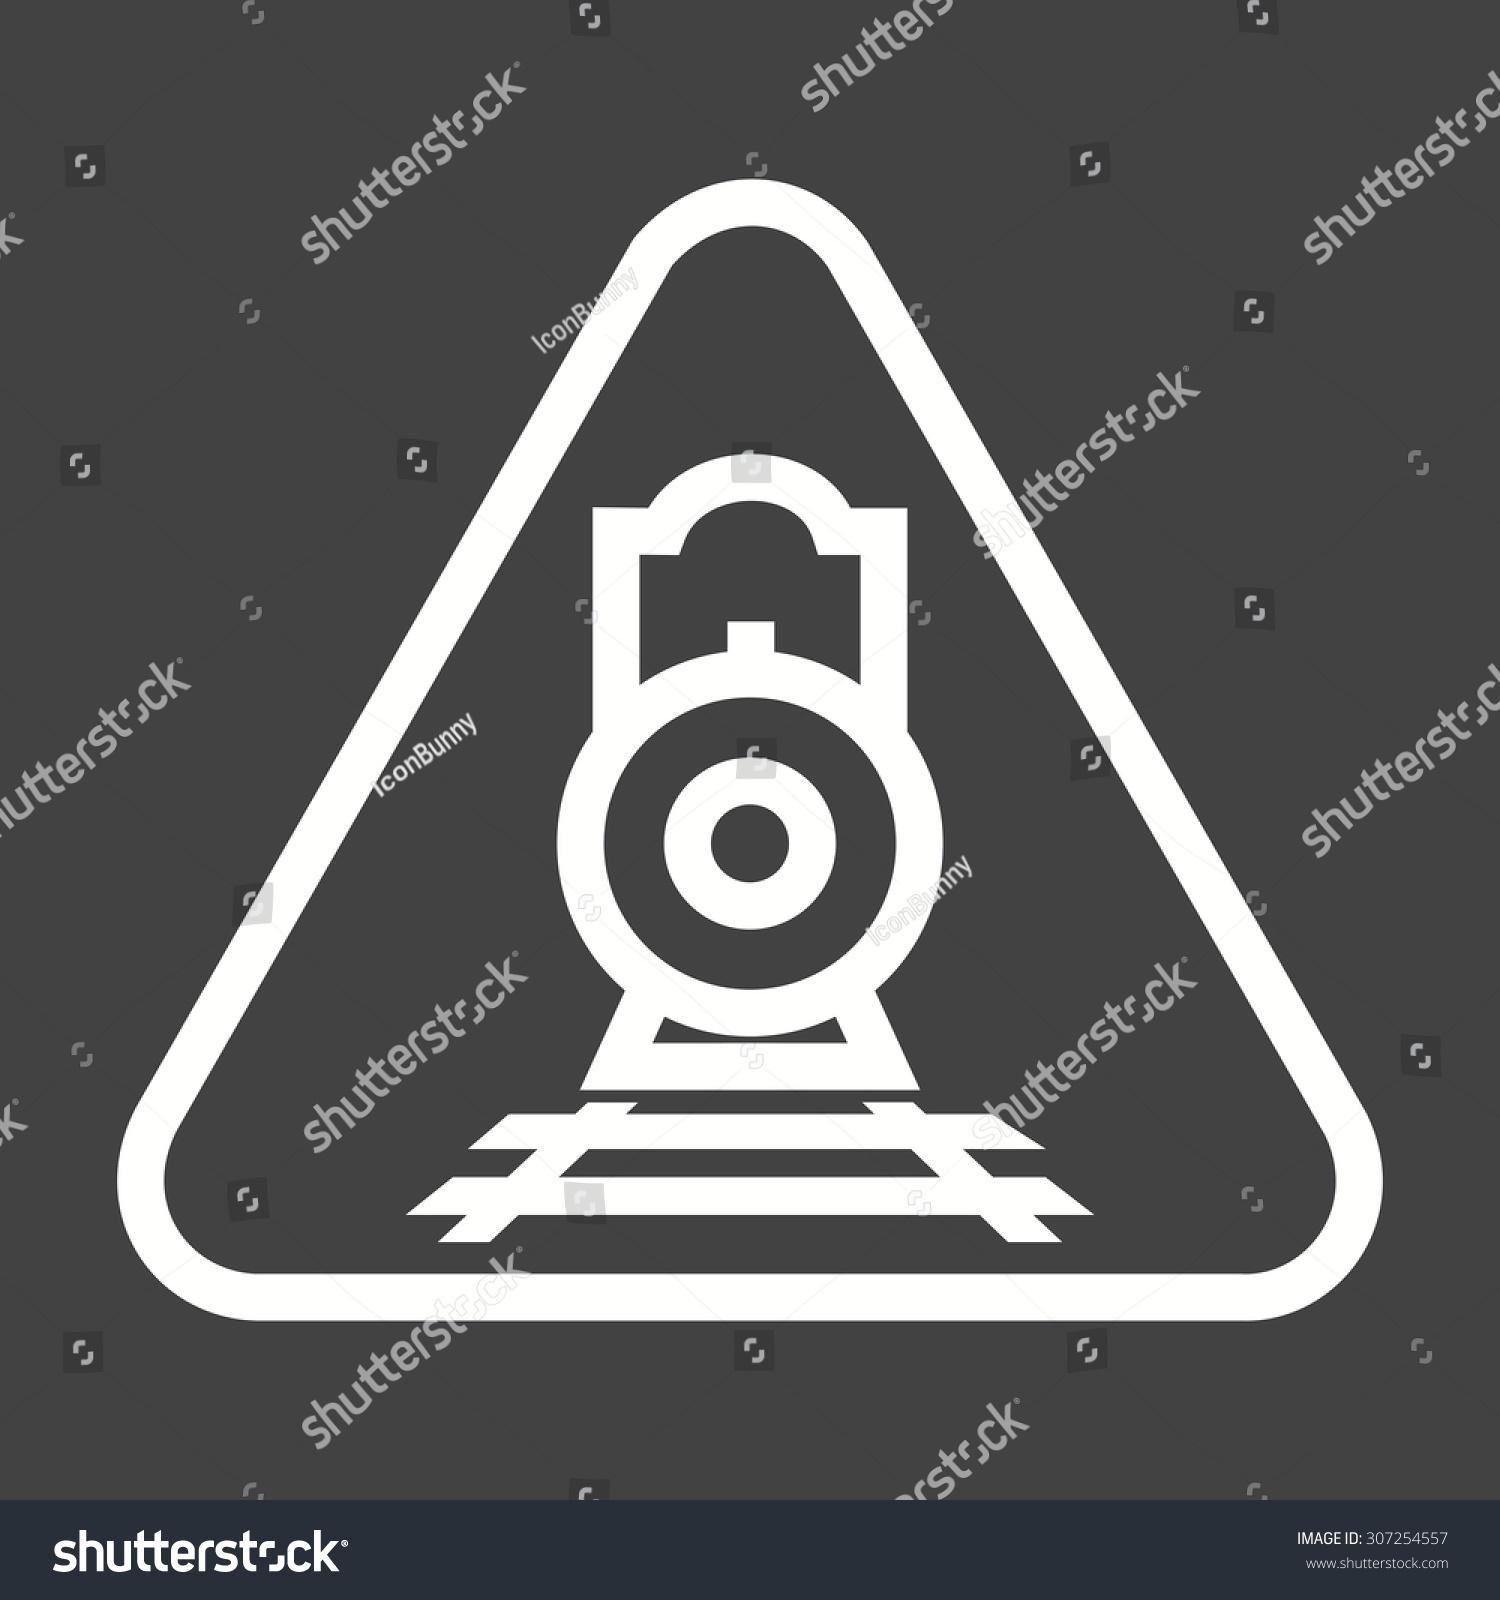 Railway Sign Crossing Icon Vector Image Stock Vector. Radioactive Signs Of Stroke. Vitamin A Deficiency Signs. Learning Signs Of Stroke. Complications Signs. Dengan Signs. Mechanic Signs. Coloring Pages Signs. Clean Room Signs Of Stroke